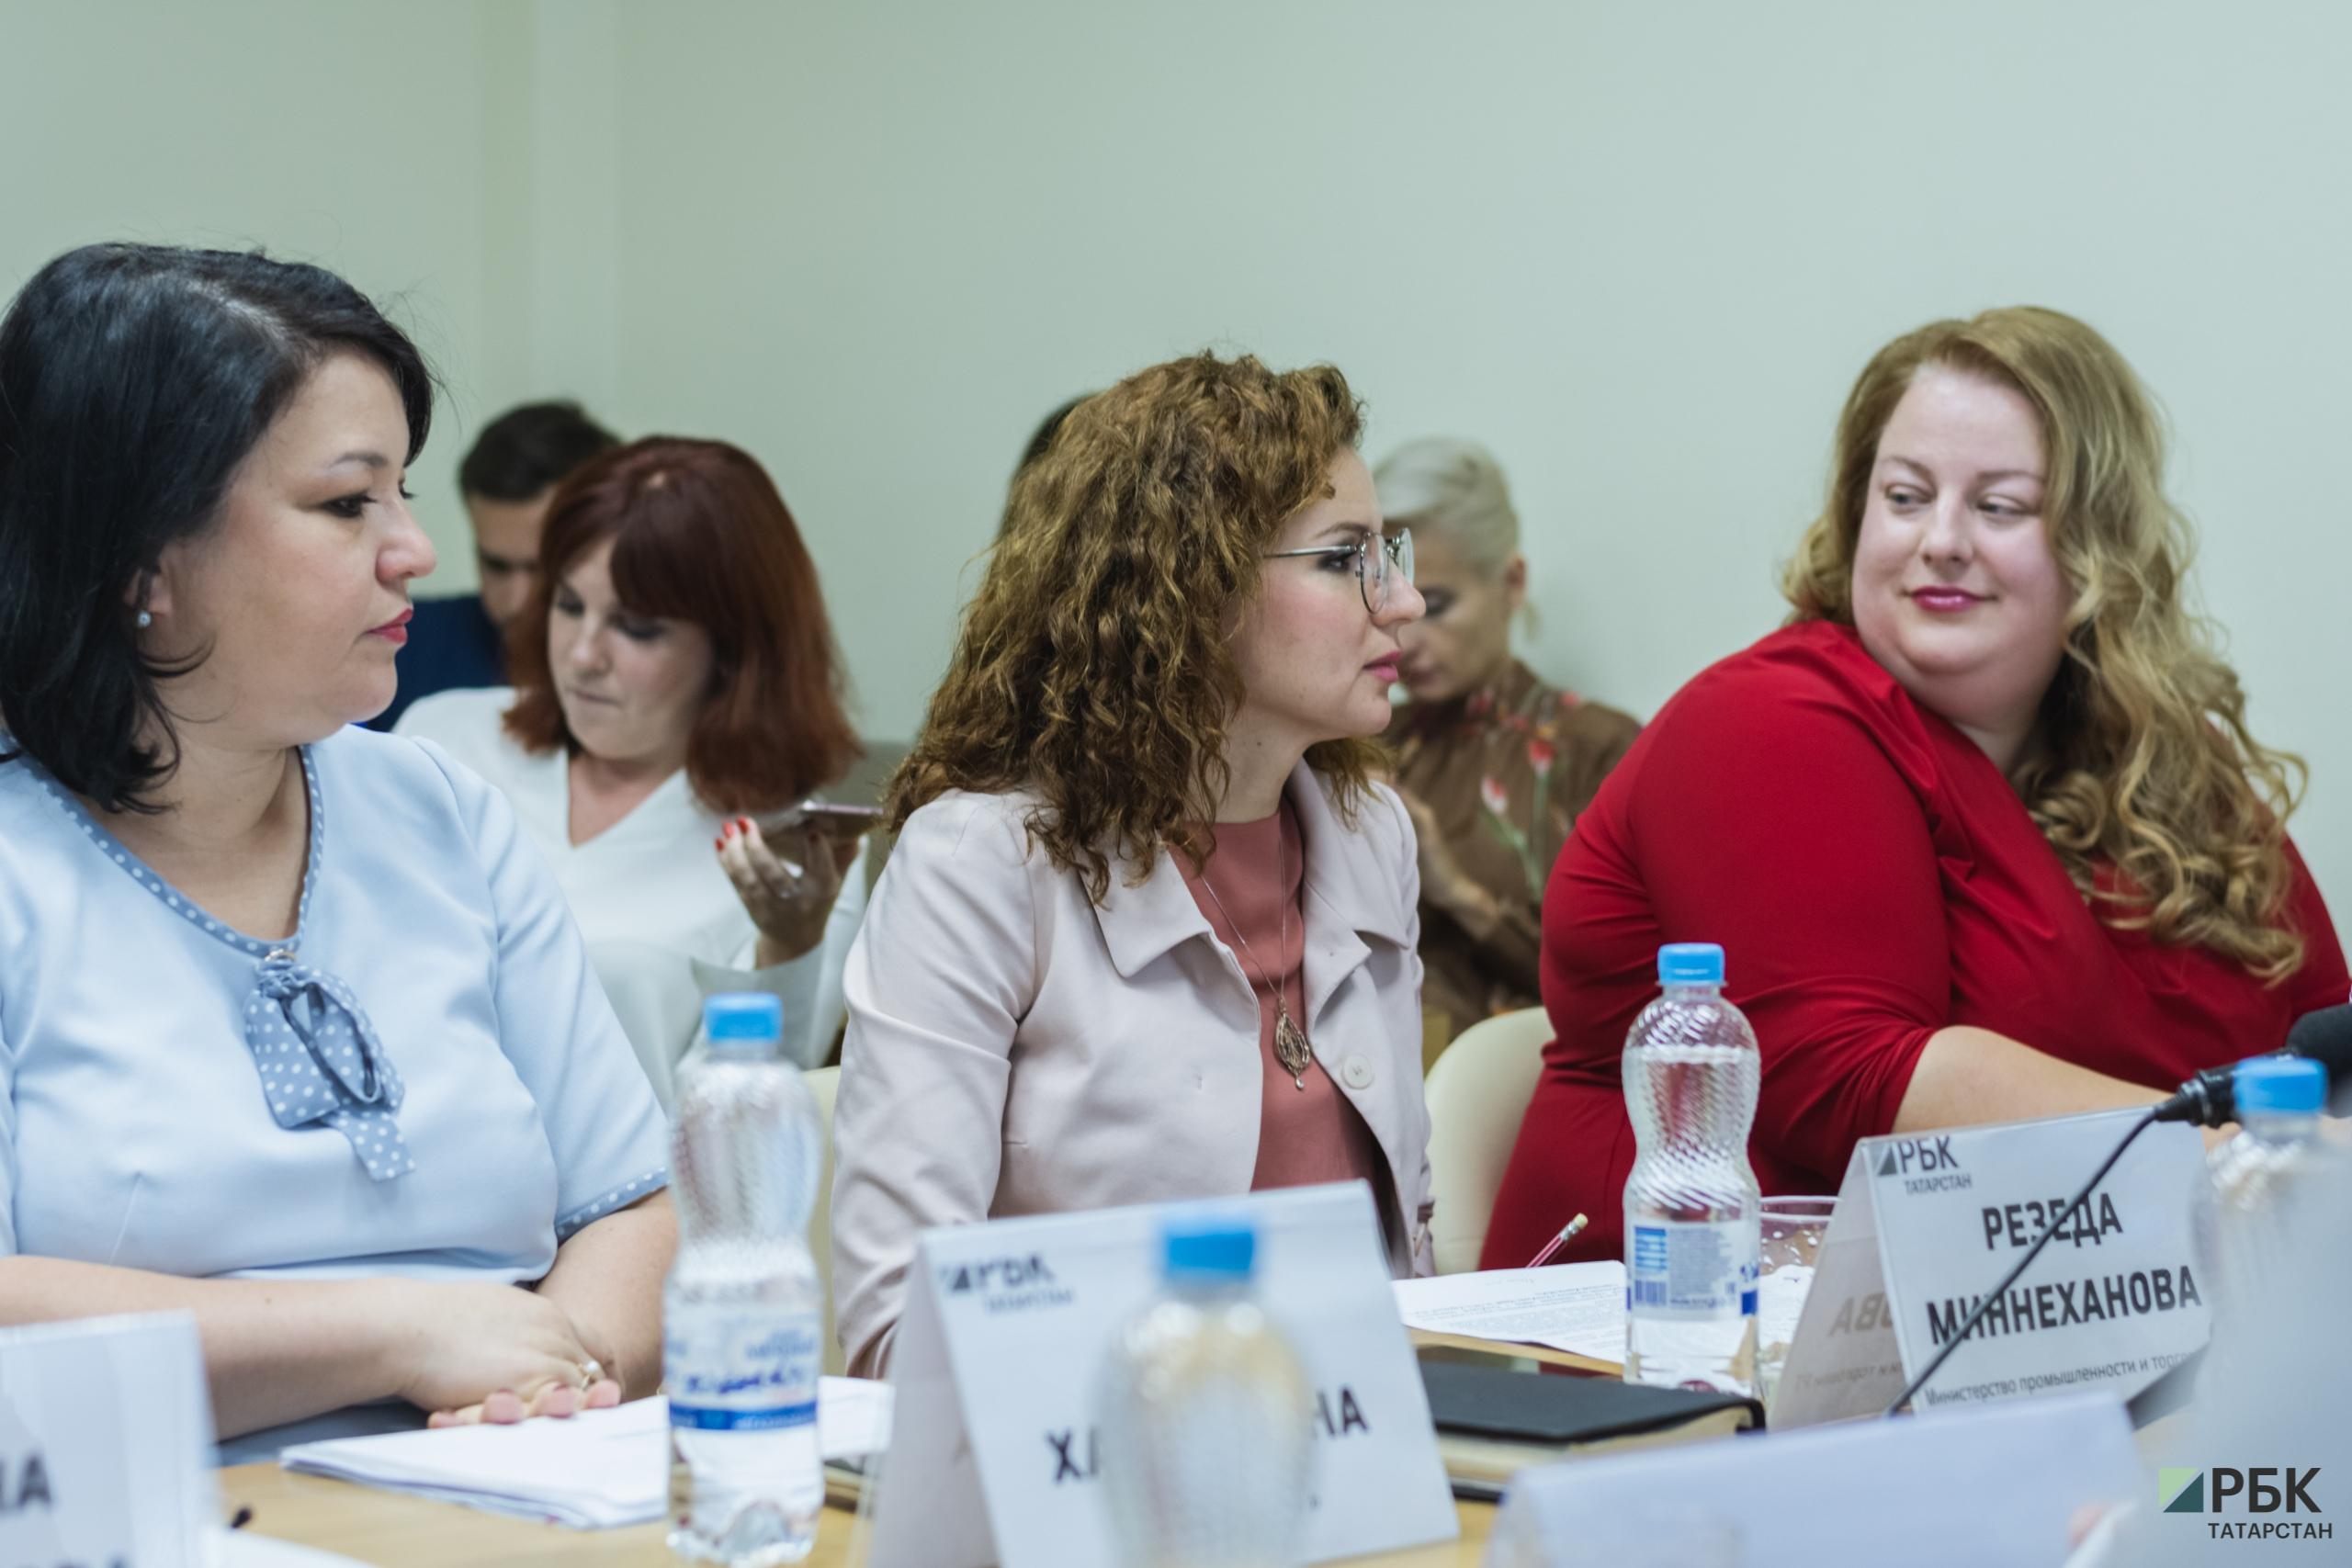 слева - направо: Алсу Хайруллина (ООО «Алкоторг»), Резеда Миннеханова (минпромторг РТ), Мария Яшенкова (агентство Bright Consulting)